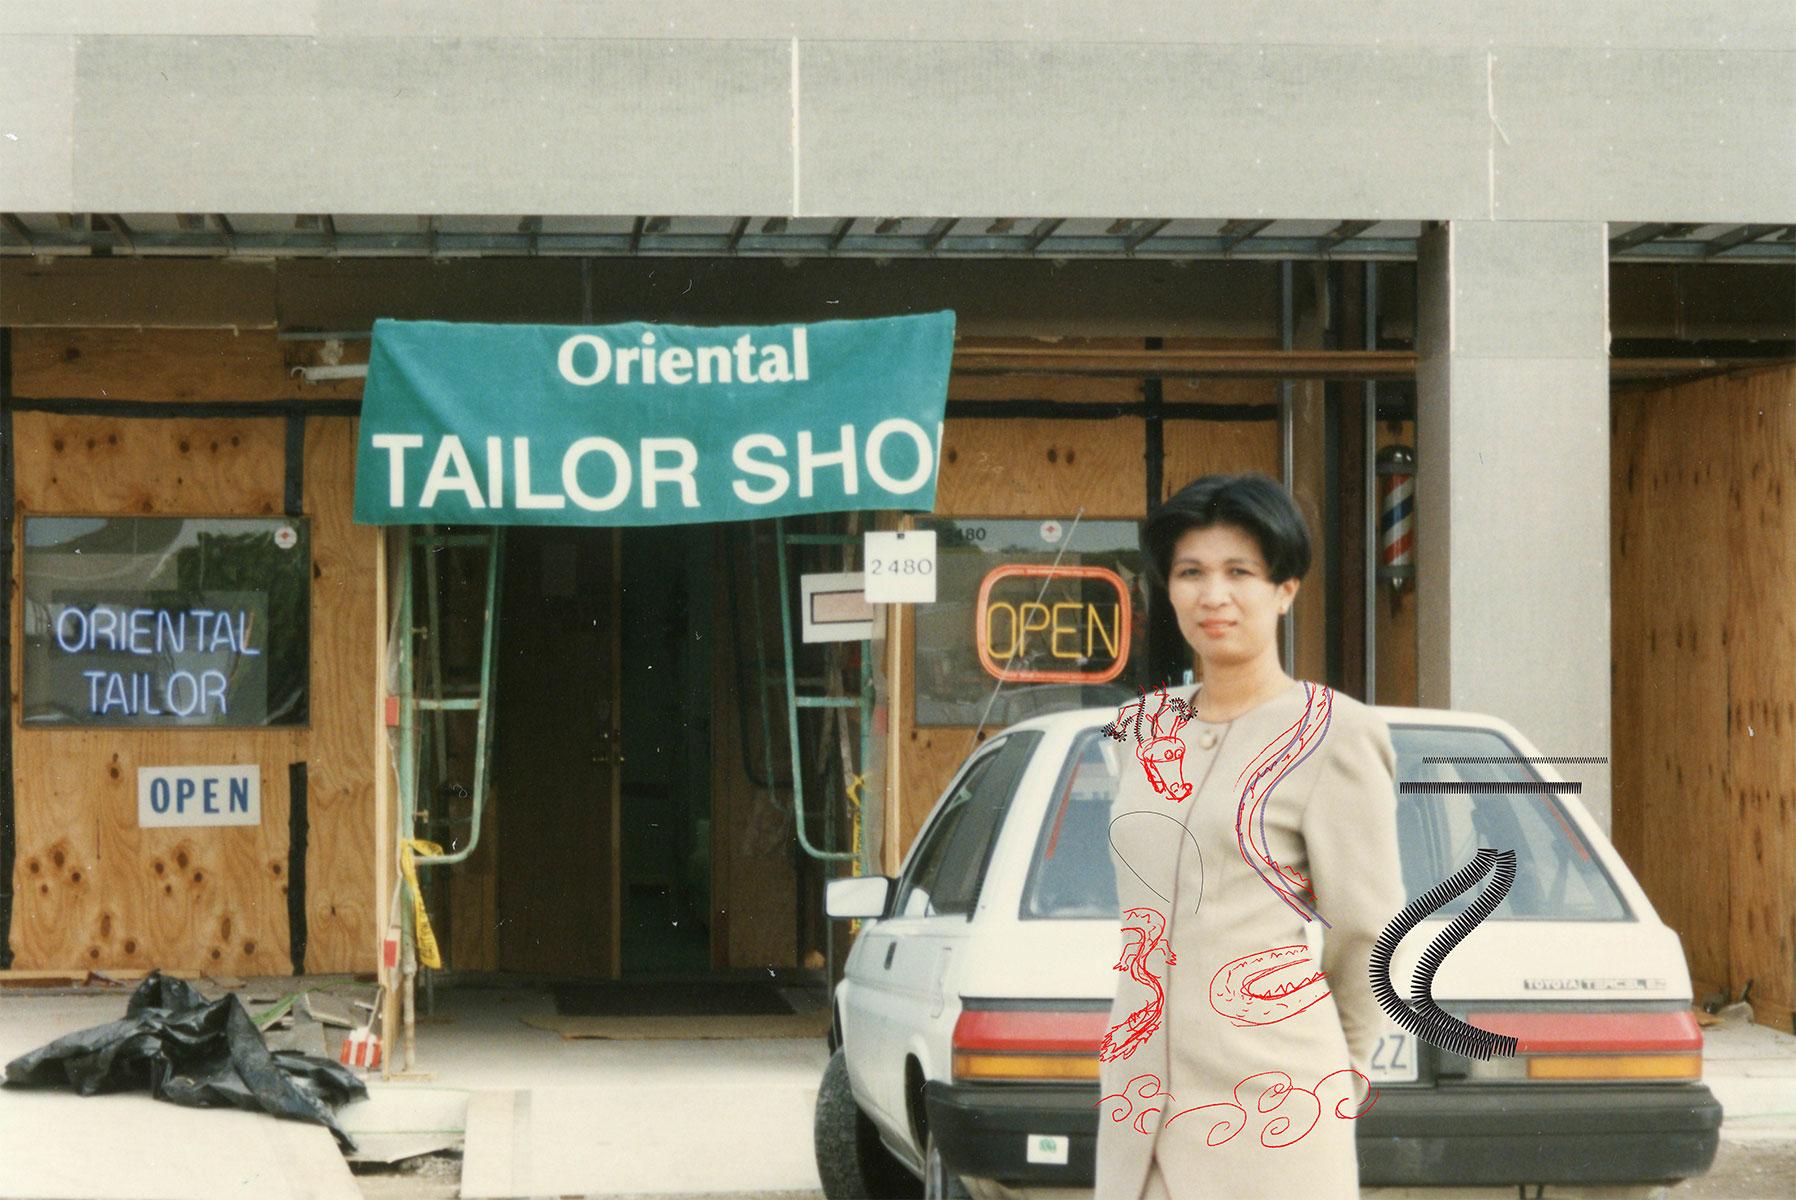 oriental-tailor-shop_embroidered-dragon_x1200_190113_nh_v1.0.0_lr.jpg